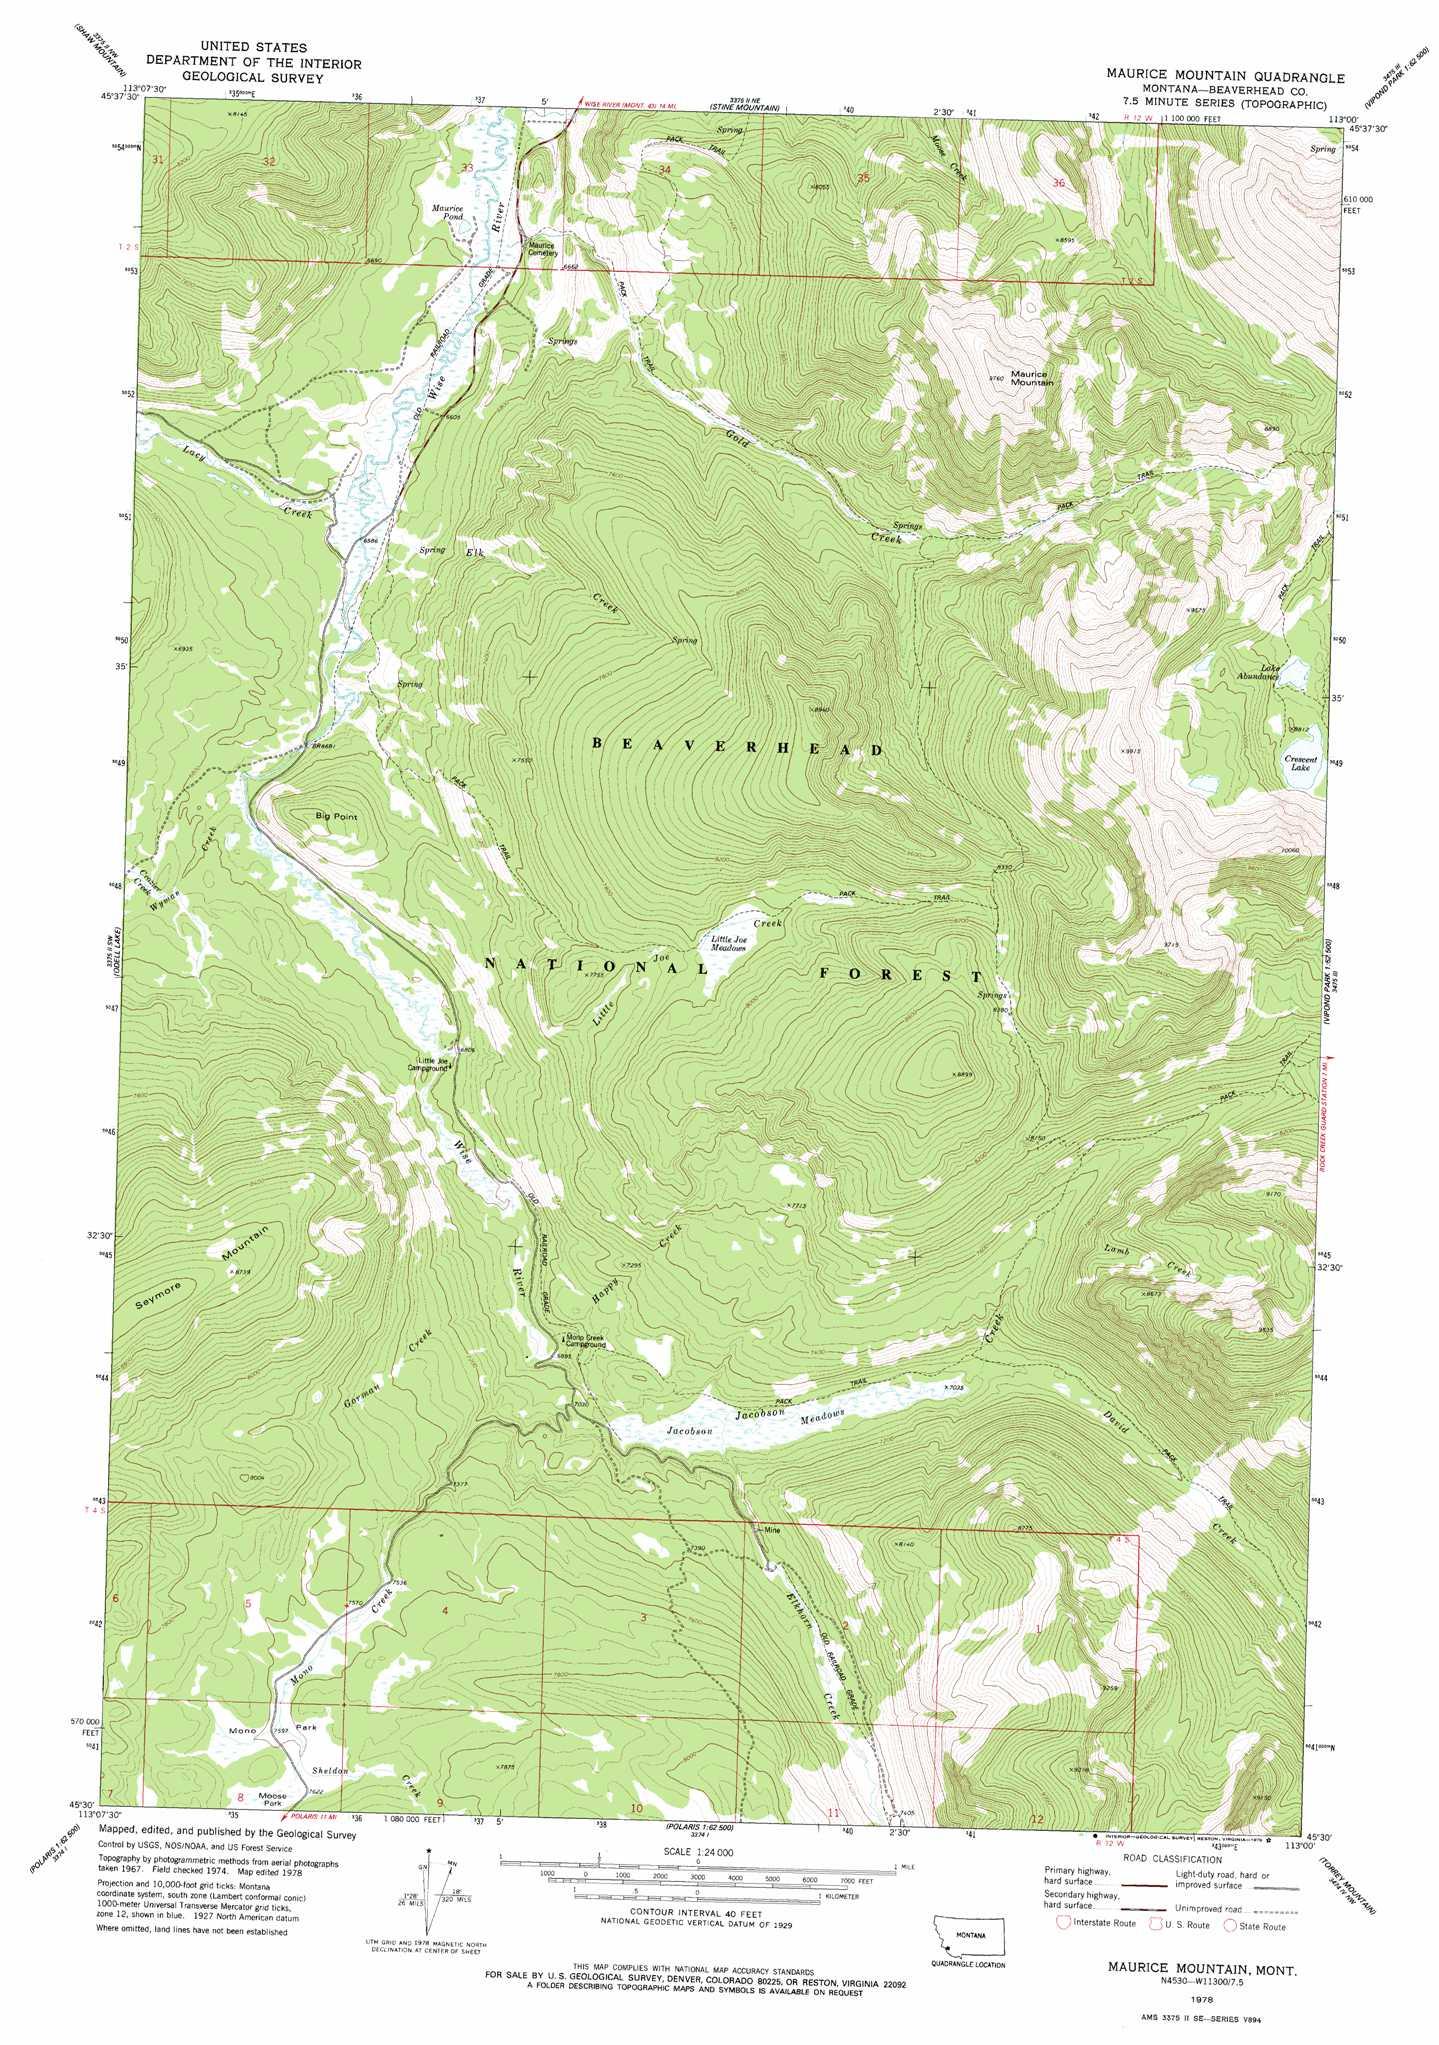 Maurice Mountain topographic map, MT - USGS Topo Quad 45113e1